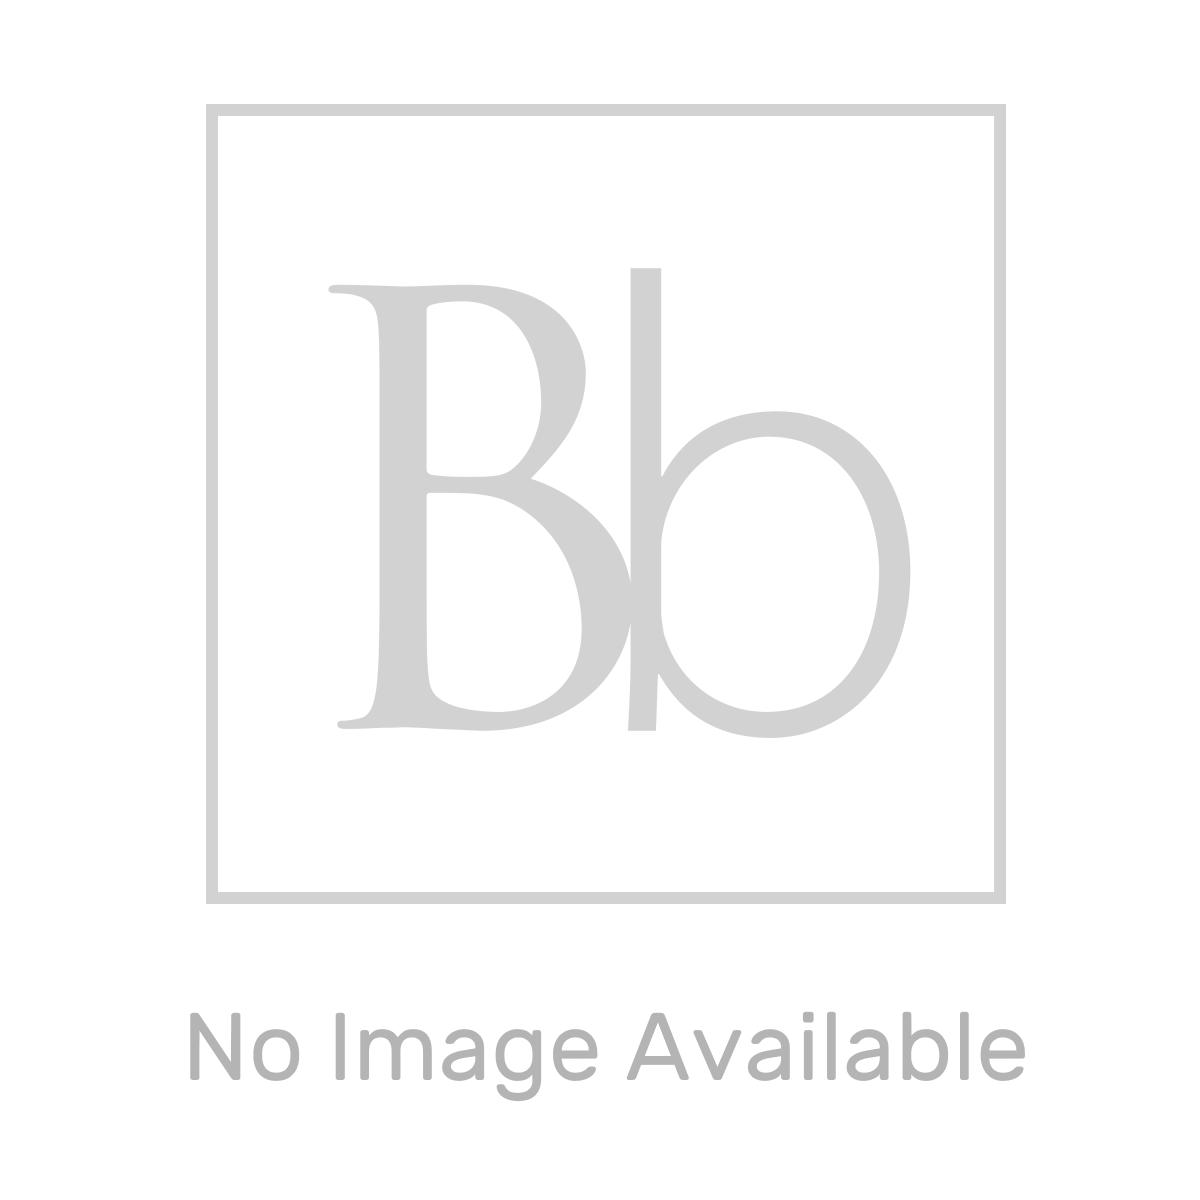 Aquadart White Slate Shower Tray 1700 x 900